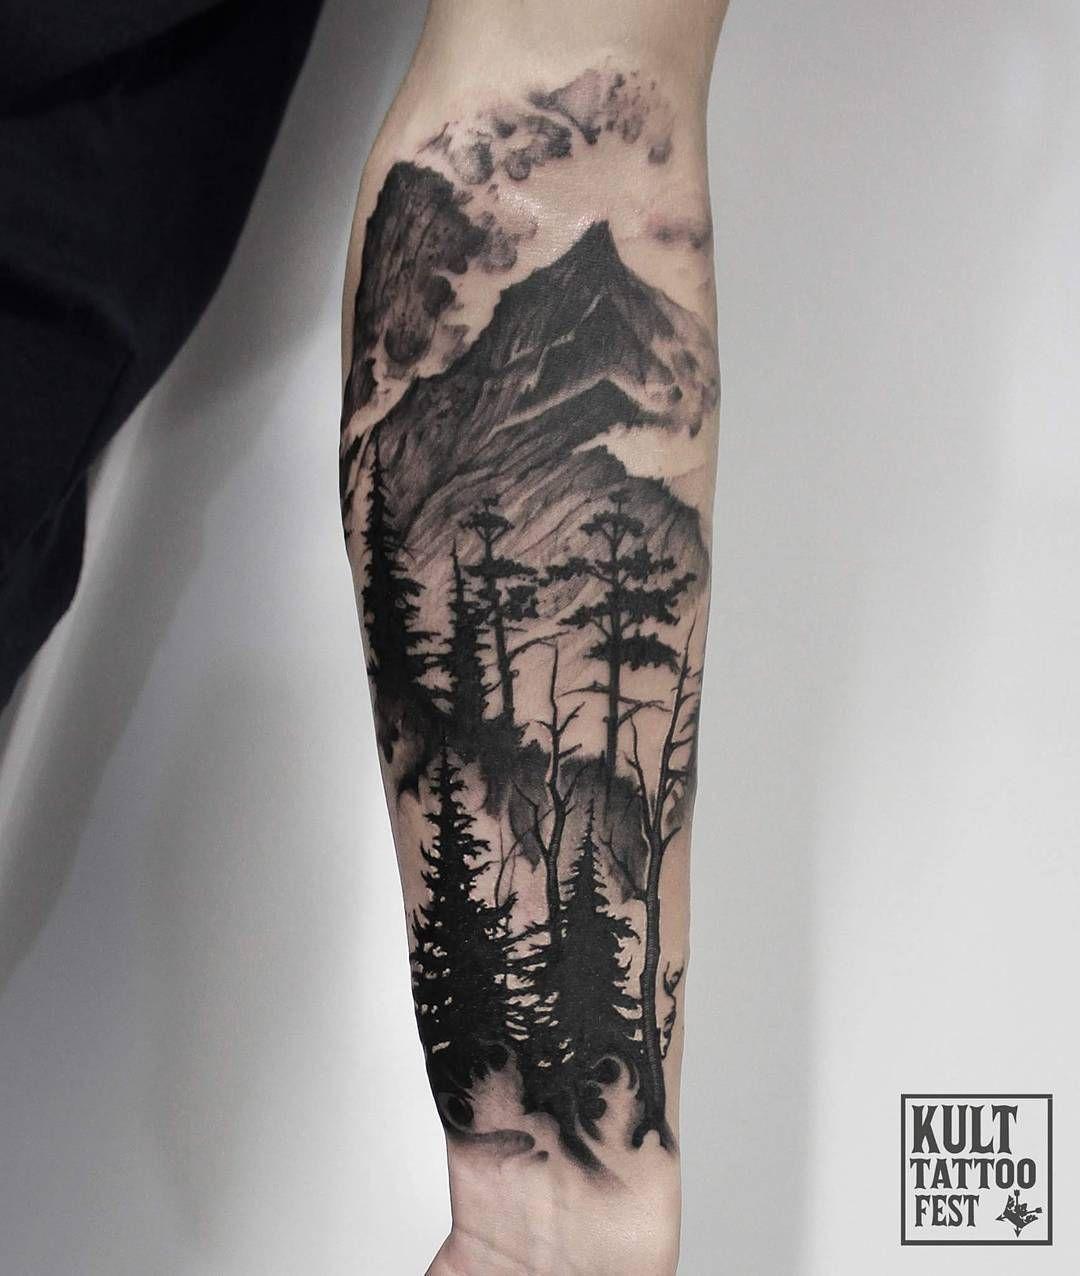 8b48686b379e3 Half sleeve tattoo idea. | Classy Tats | Tattoos for guys, Full ...